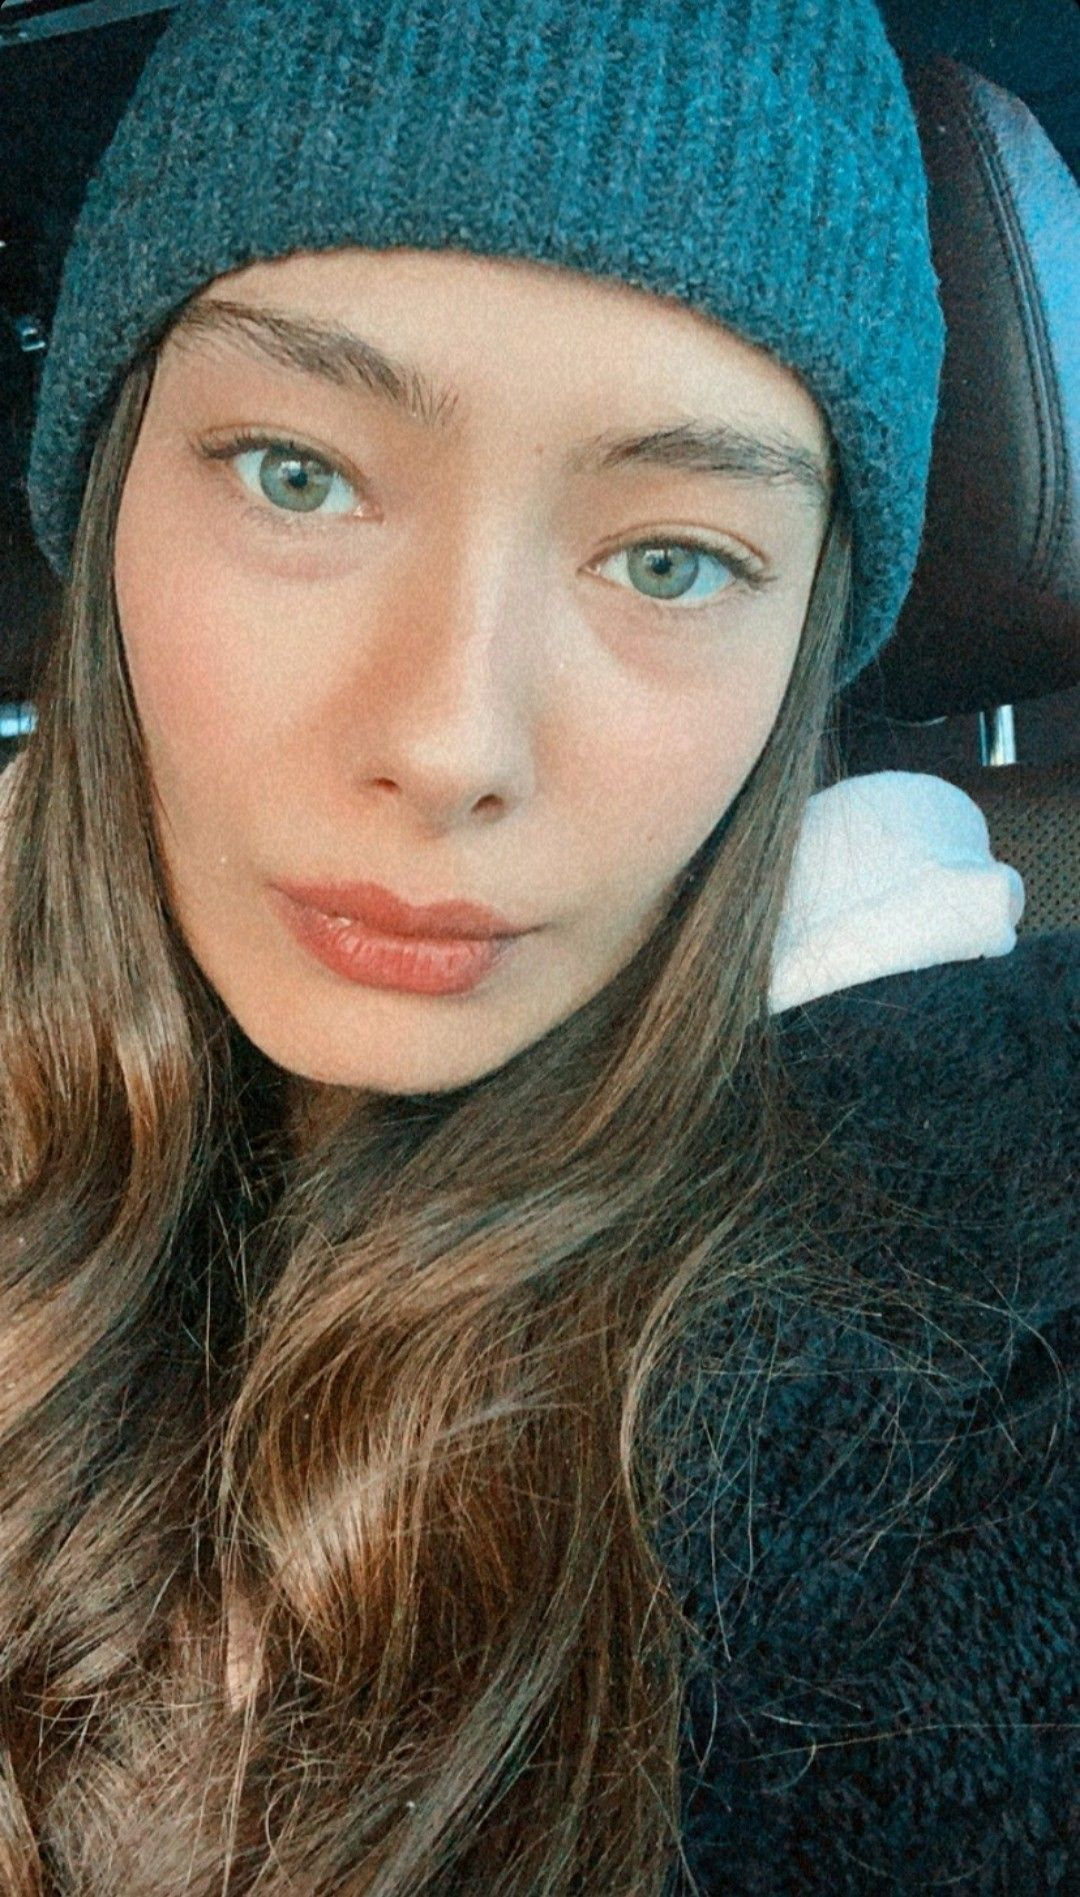 Neslihan Atagul In 2021 Winter Photoshoot Turkish Women Beautiful Dark Hair